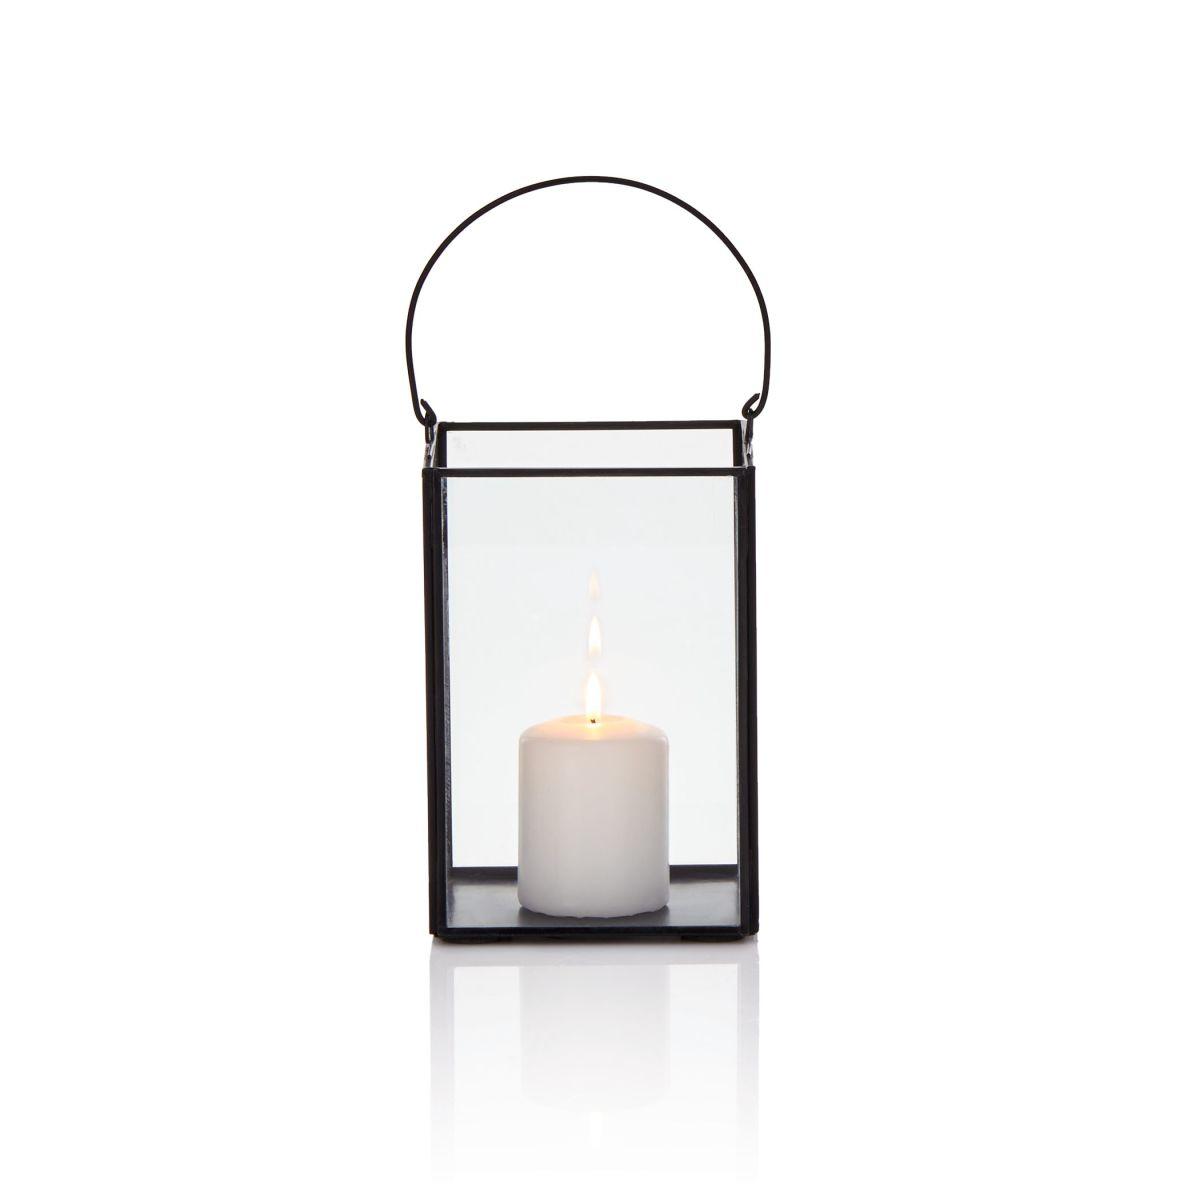 windlichter glas exklusiv g nstig kaufen. Black Bedroom Furniture Sets. Home Design Ideas